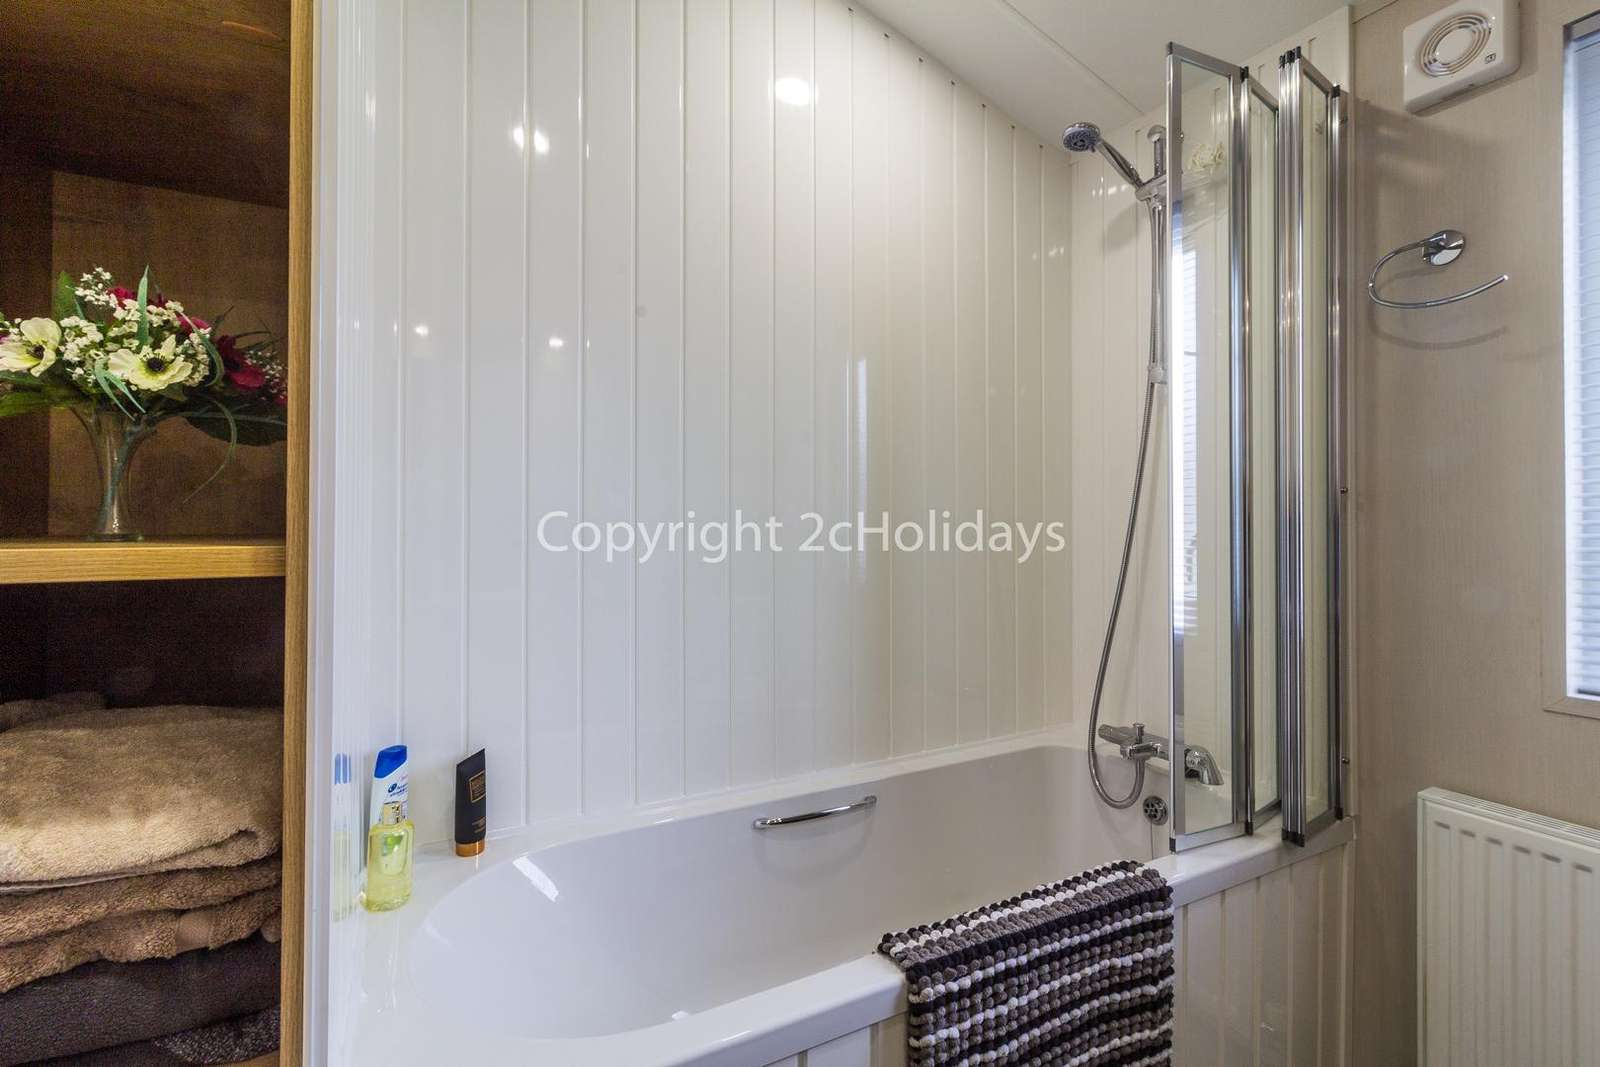 Stunning bath/shower room